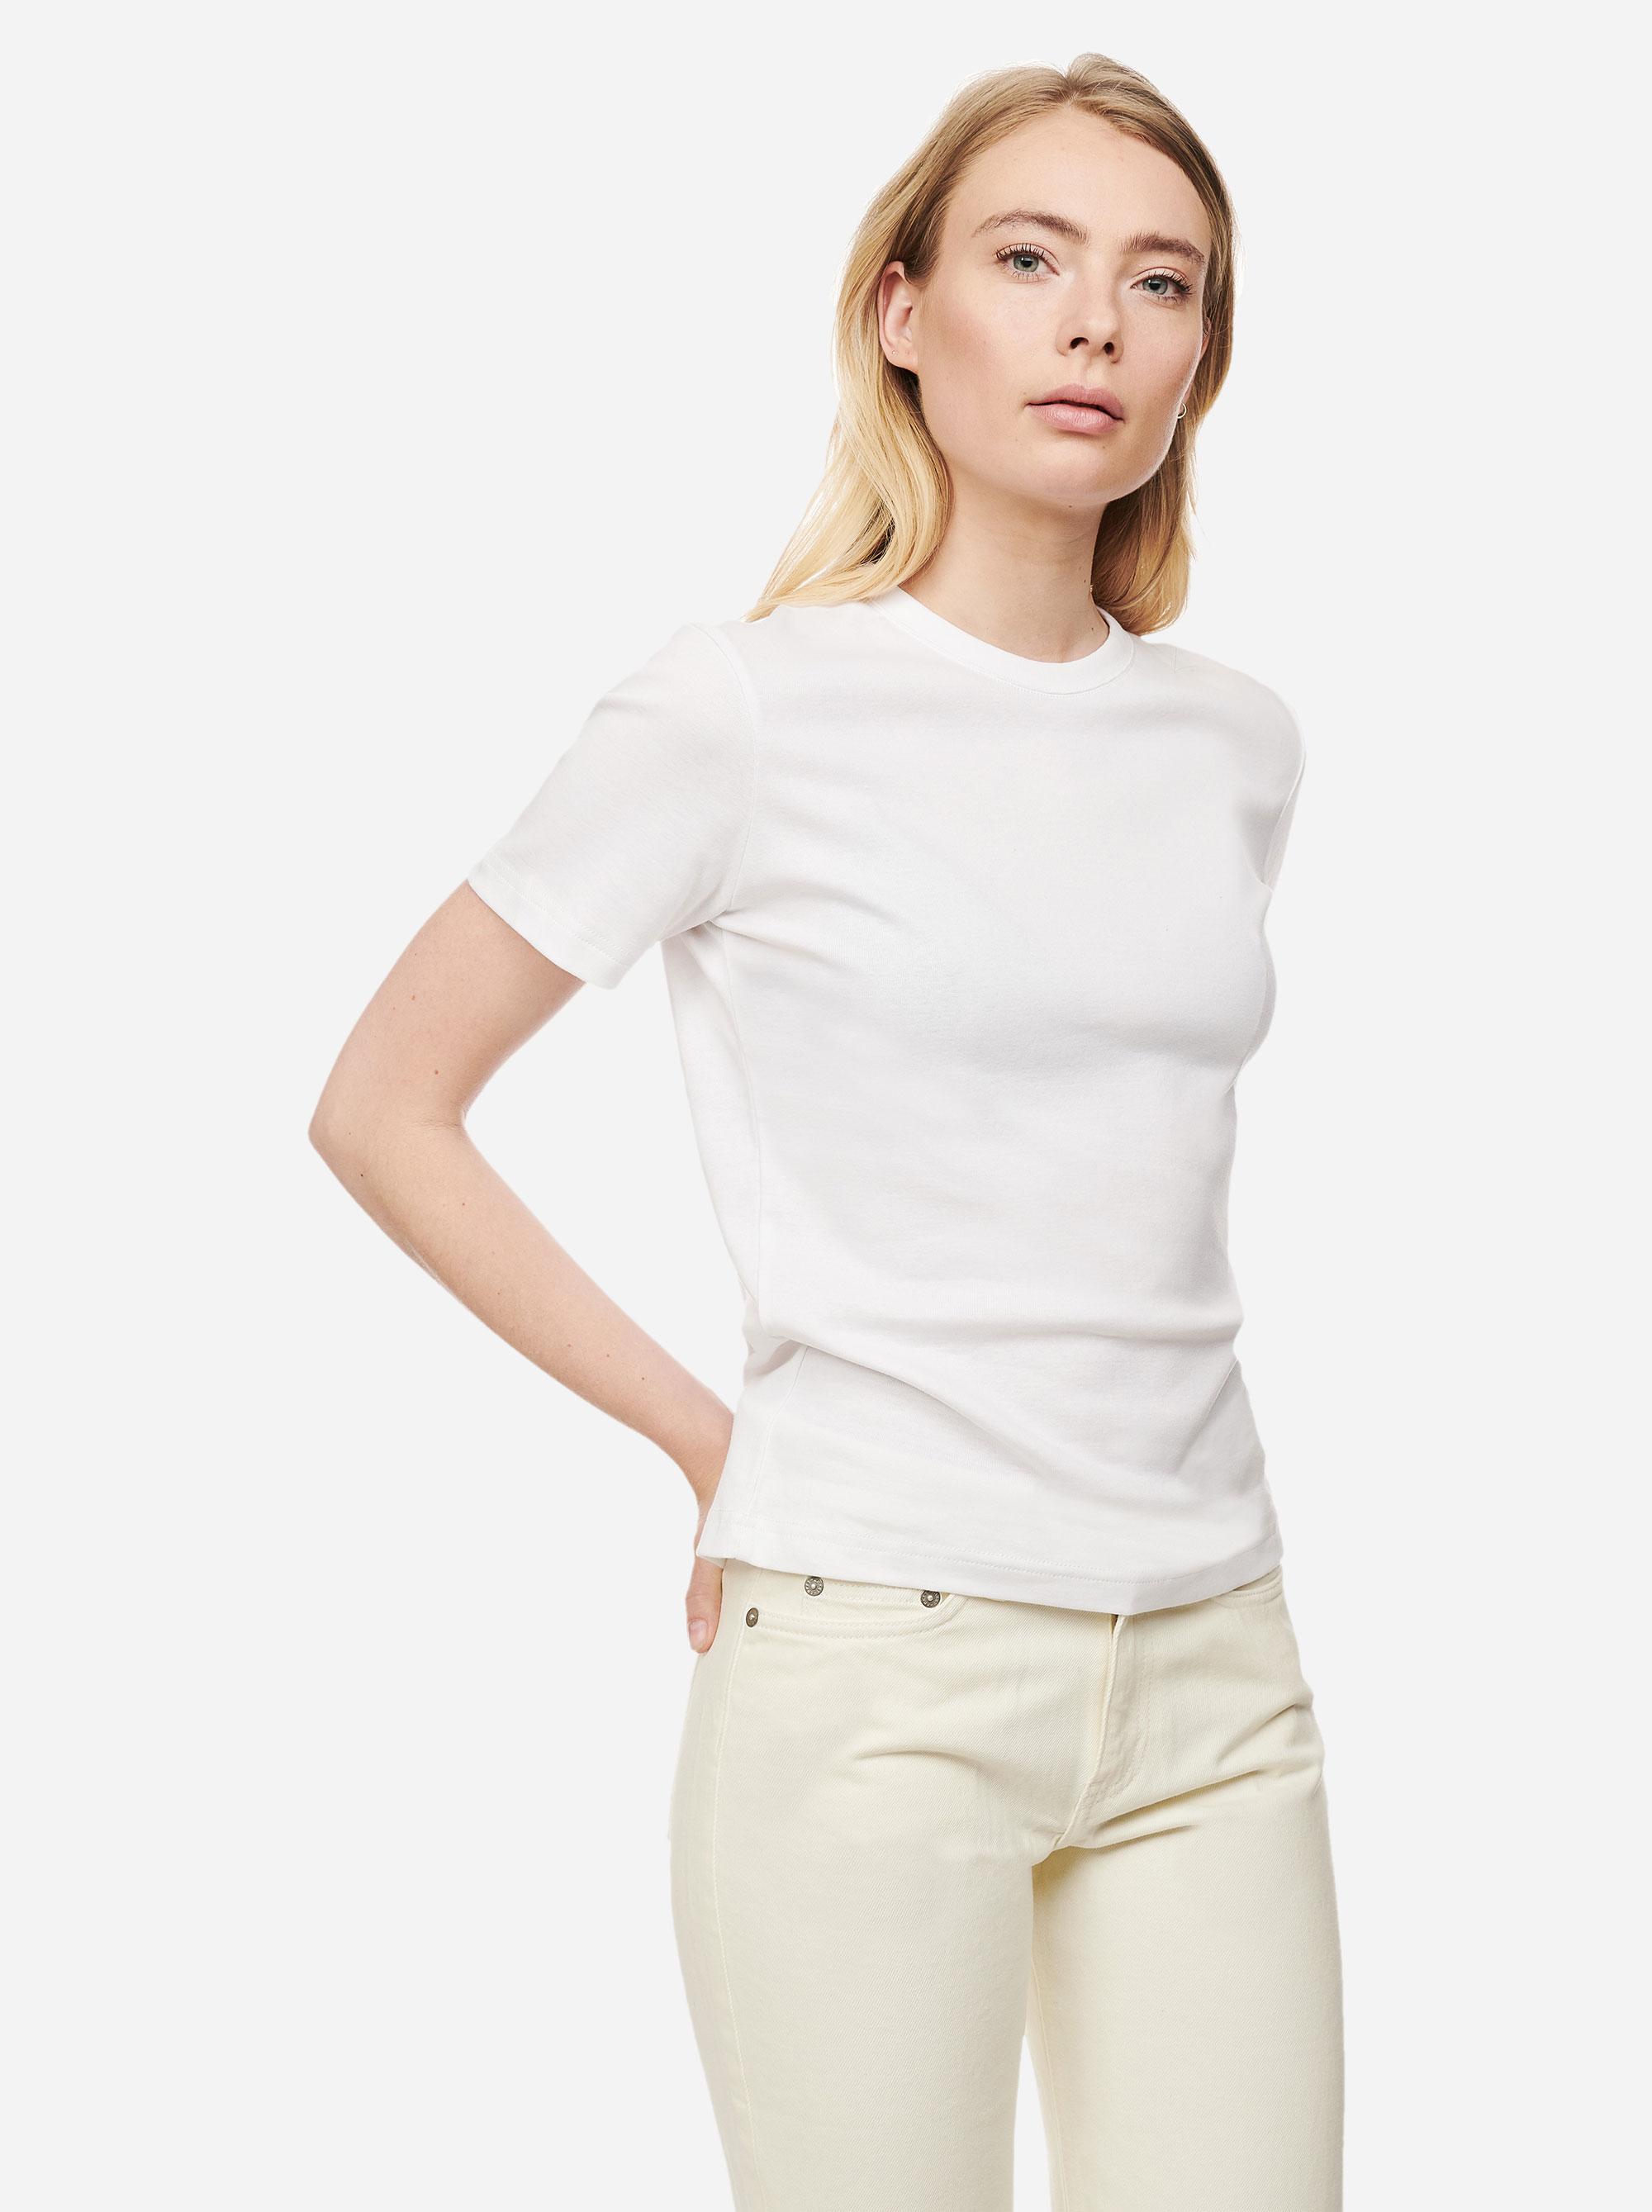 Teym - The T-Shirt - Women - White - 4